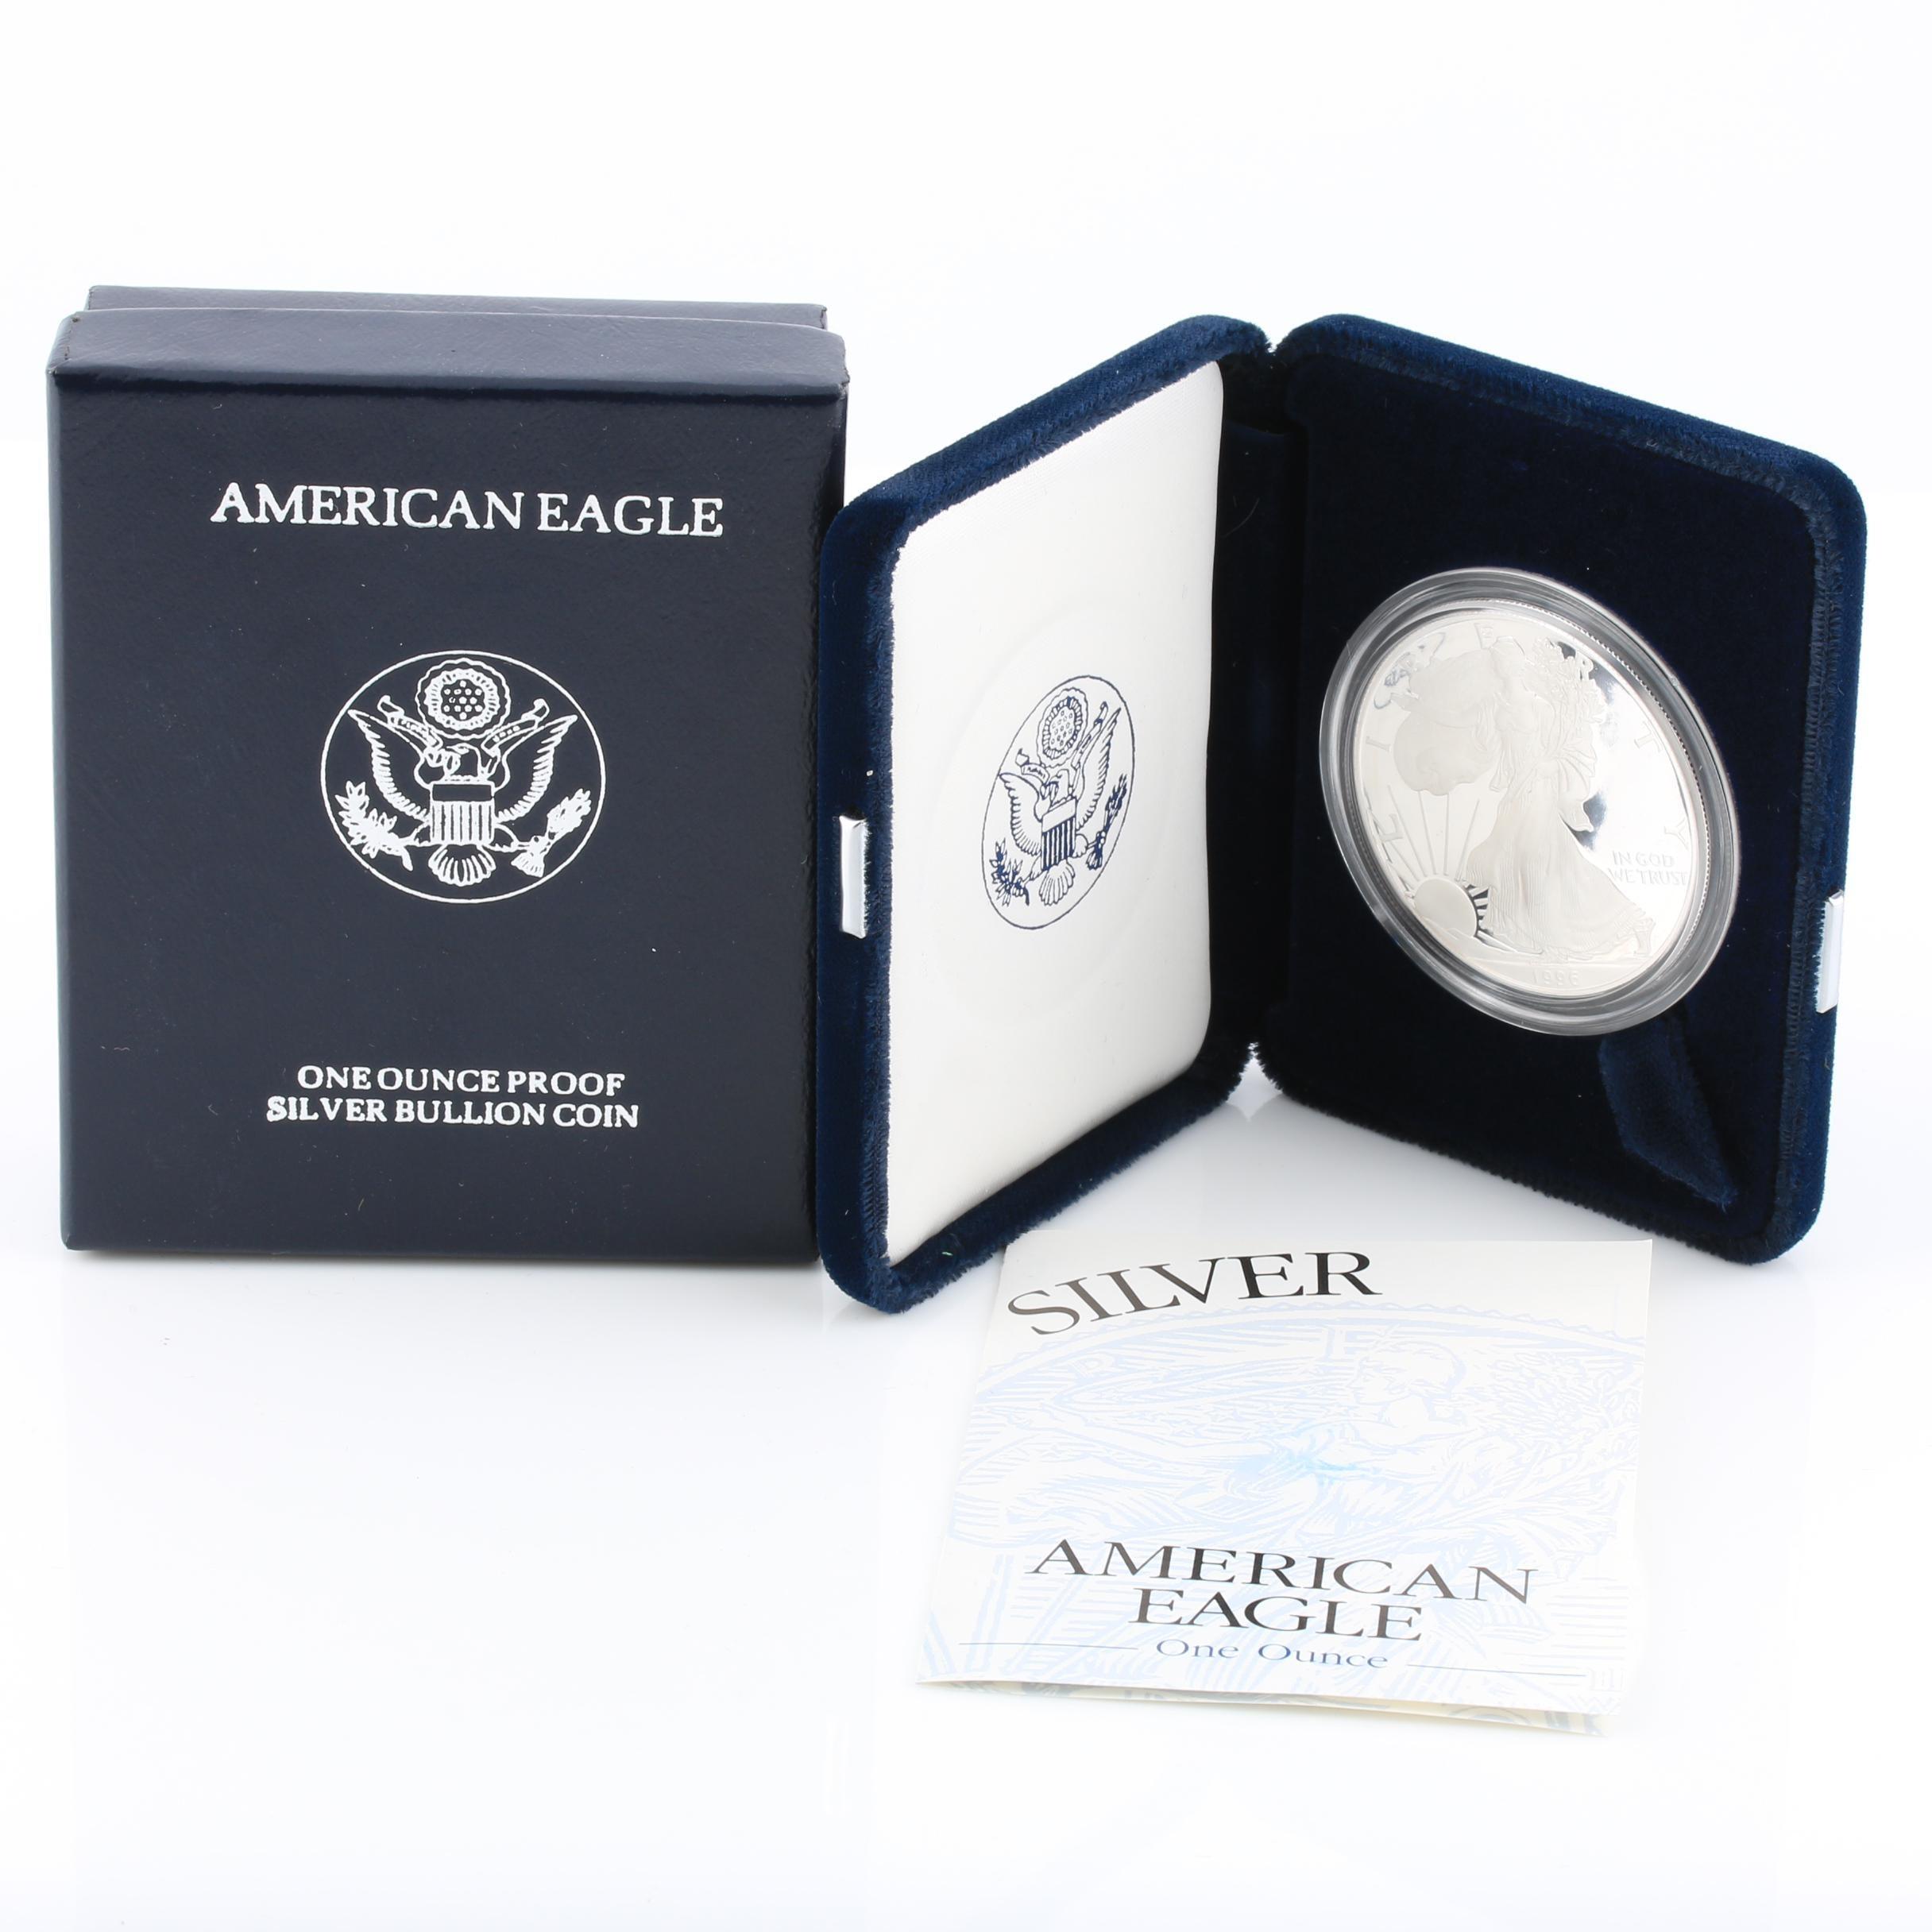 1996-P Walking Liberty Silver Eagle Proof Bullion Coin